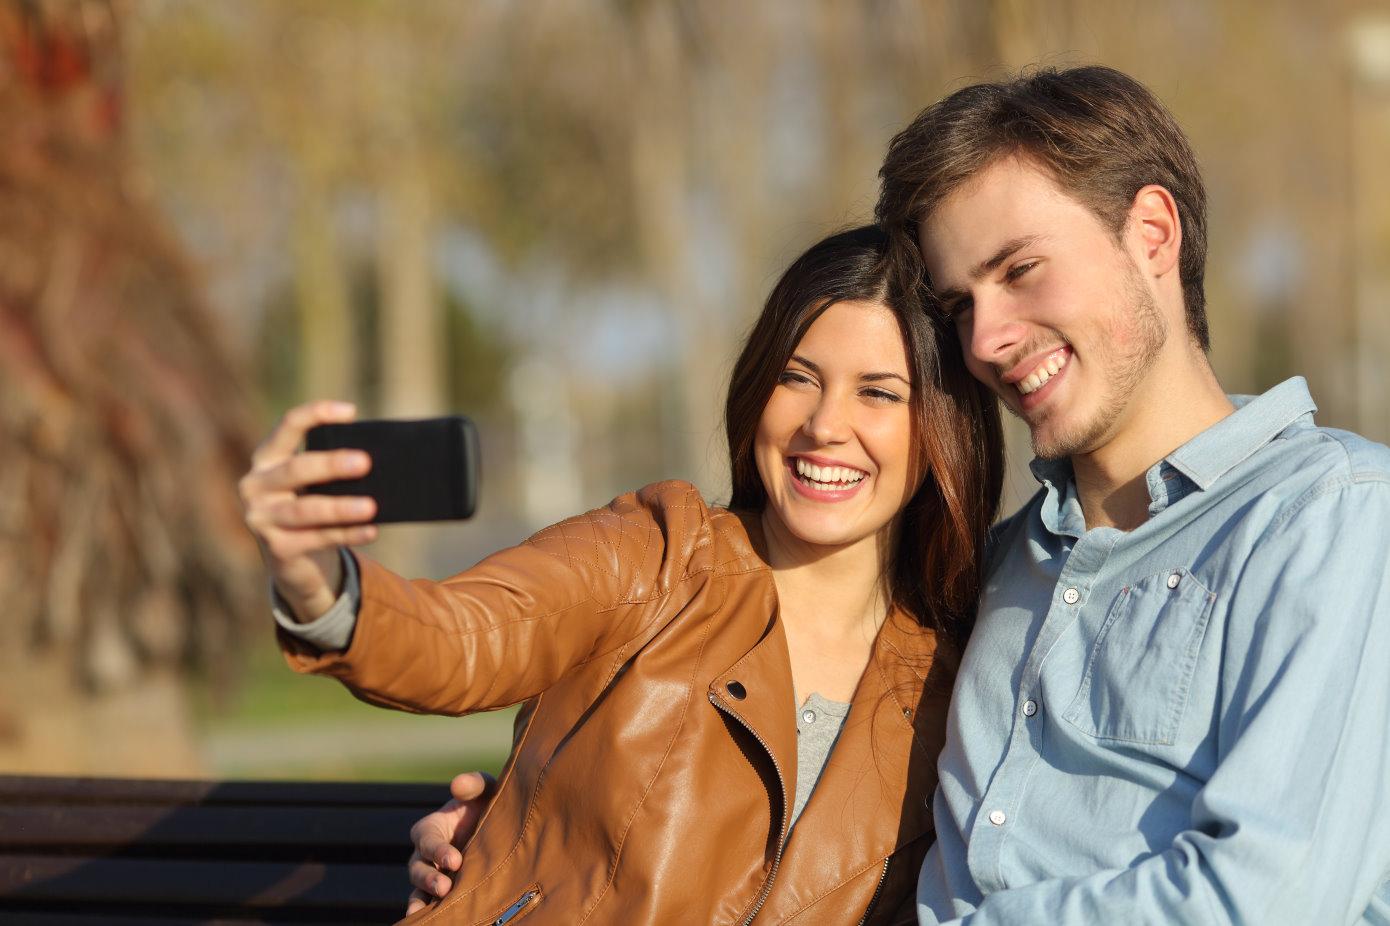 Teleranek online dating